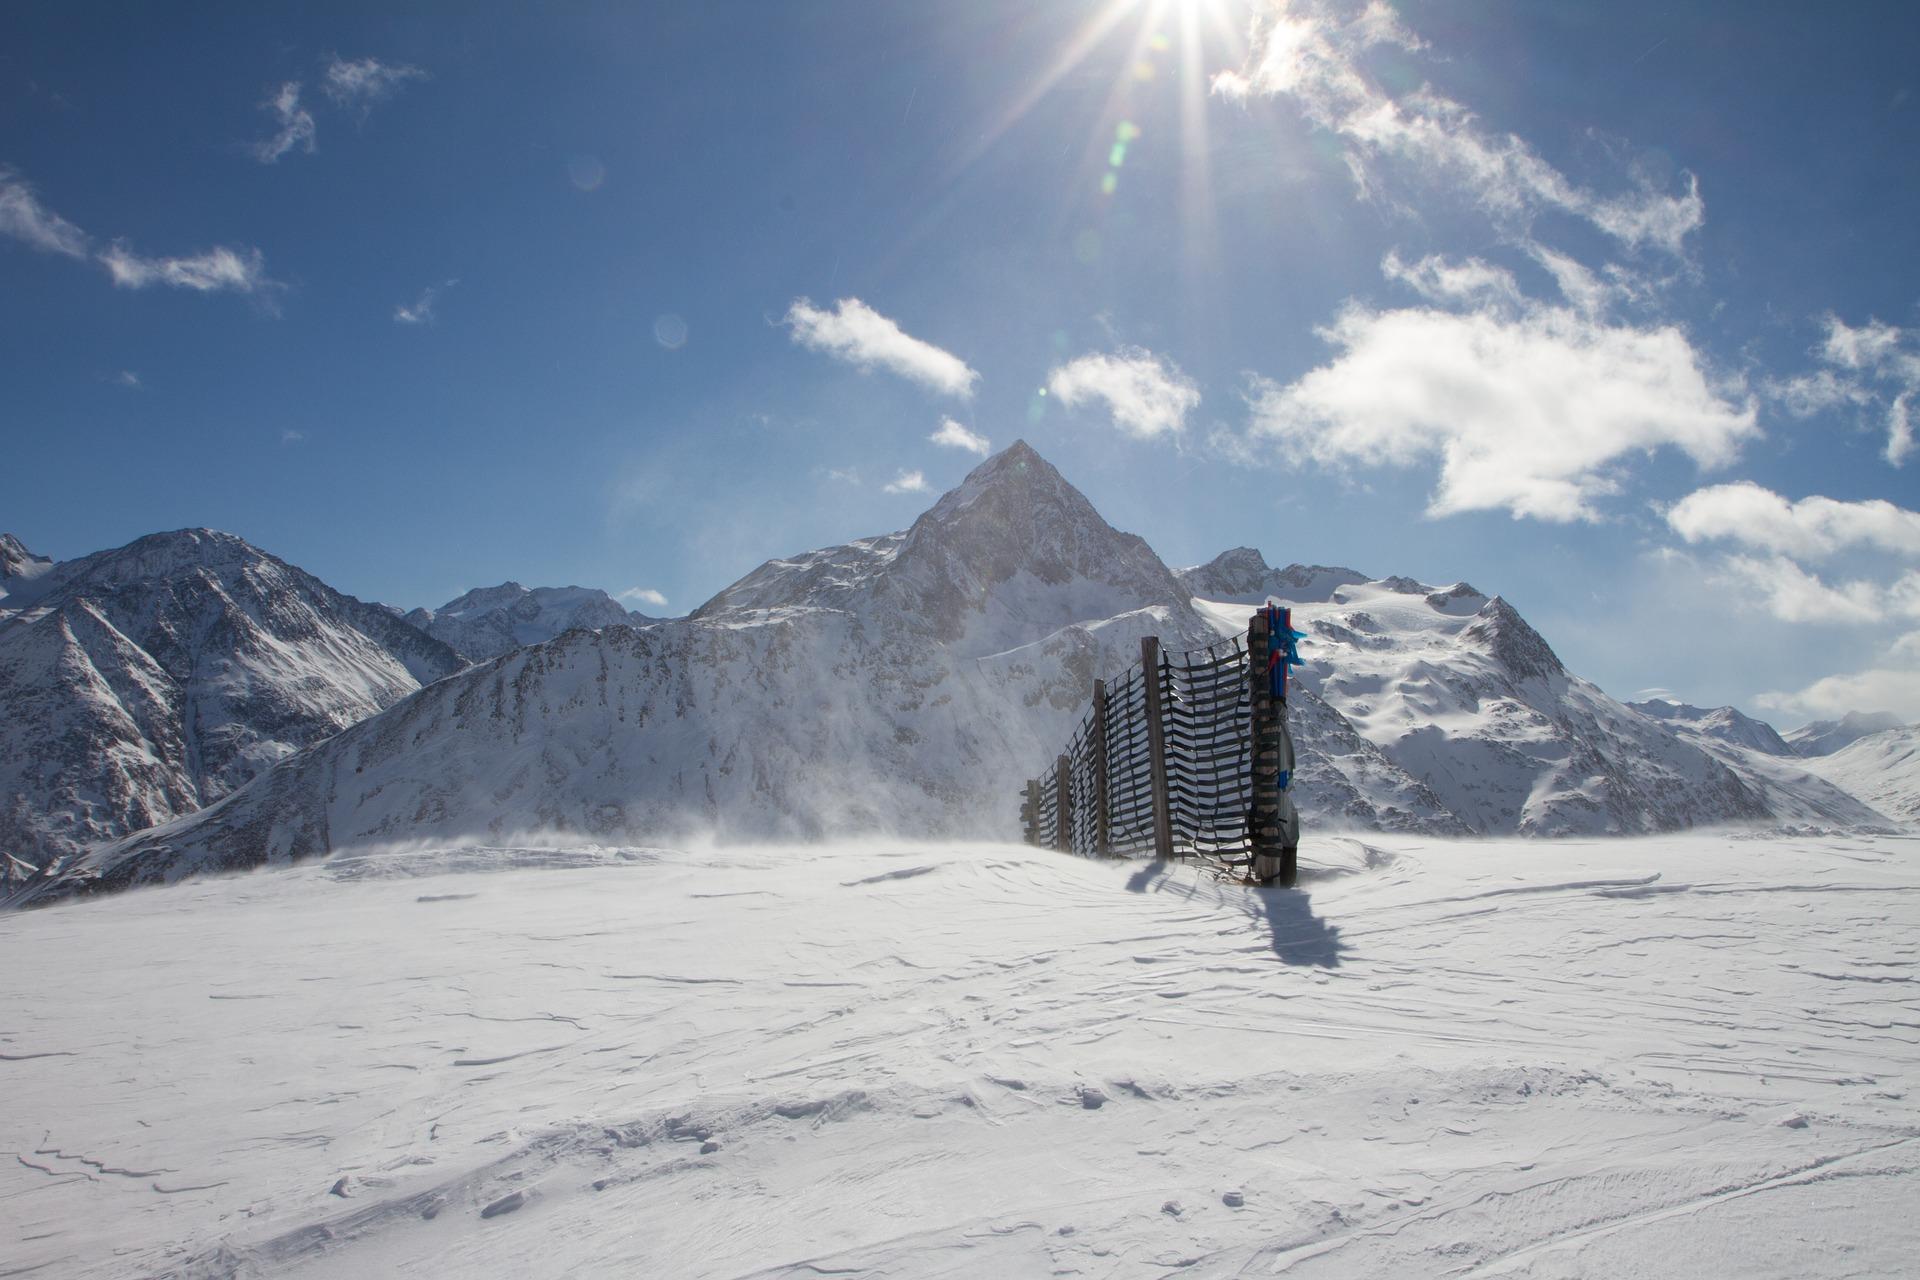 Cortina_d'Ampezzo_CC0.jpg?1543155908